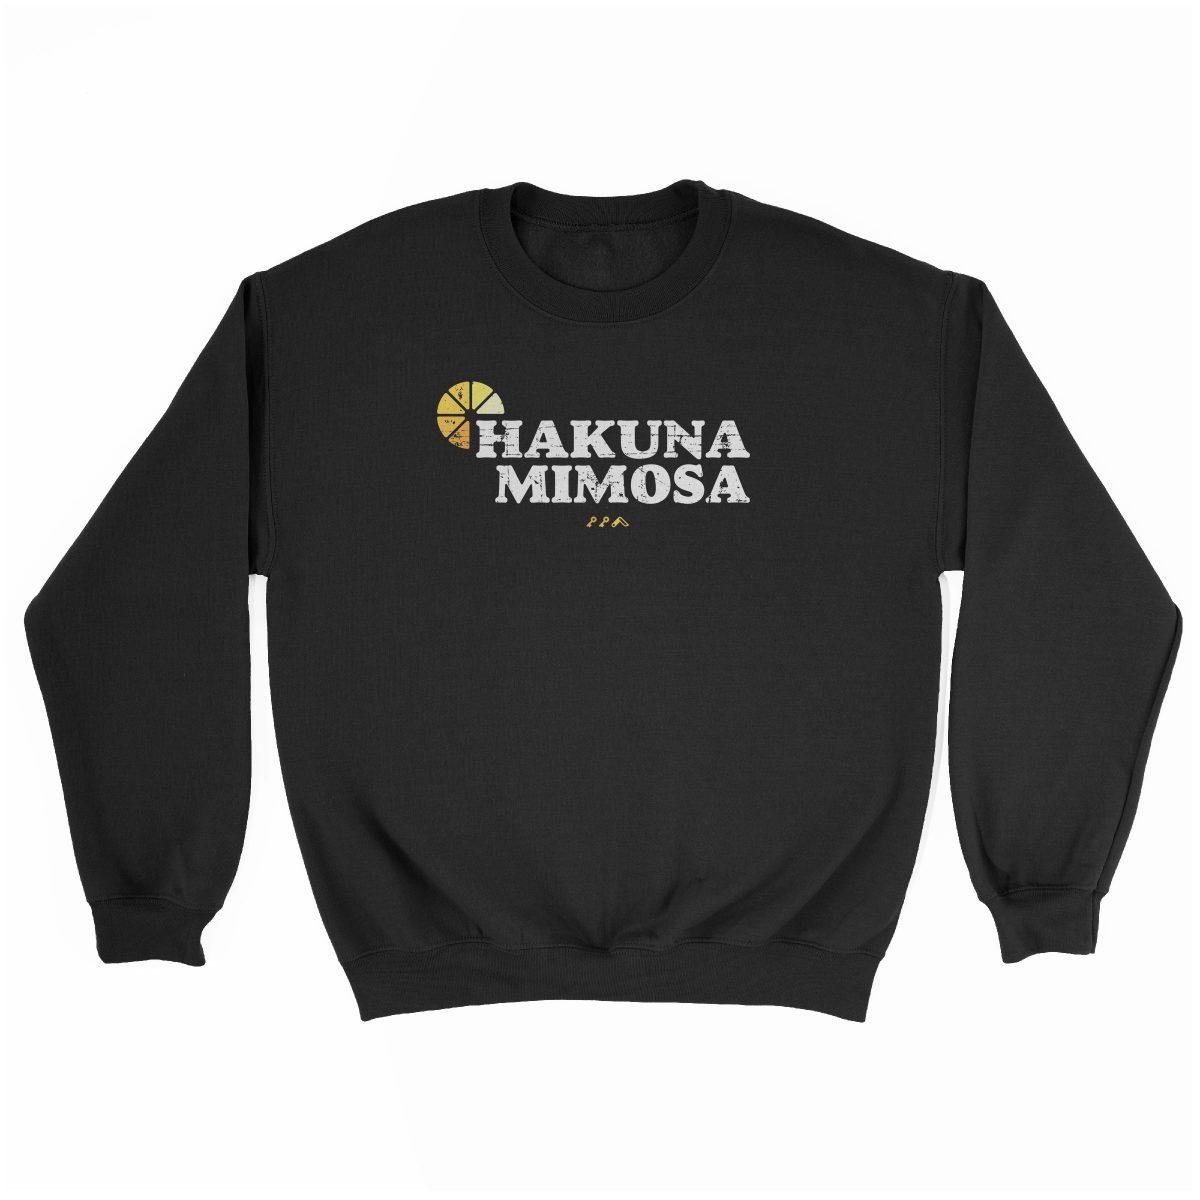 HAKUNA MIMOSA funny sunday funday brunch sweatshirt in black at kikicutt.com